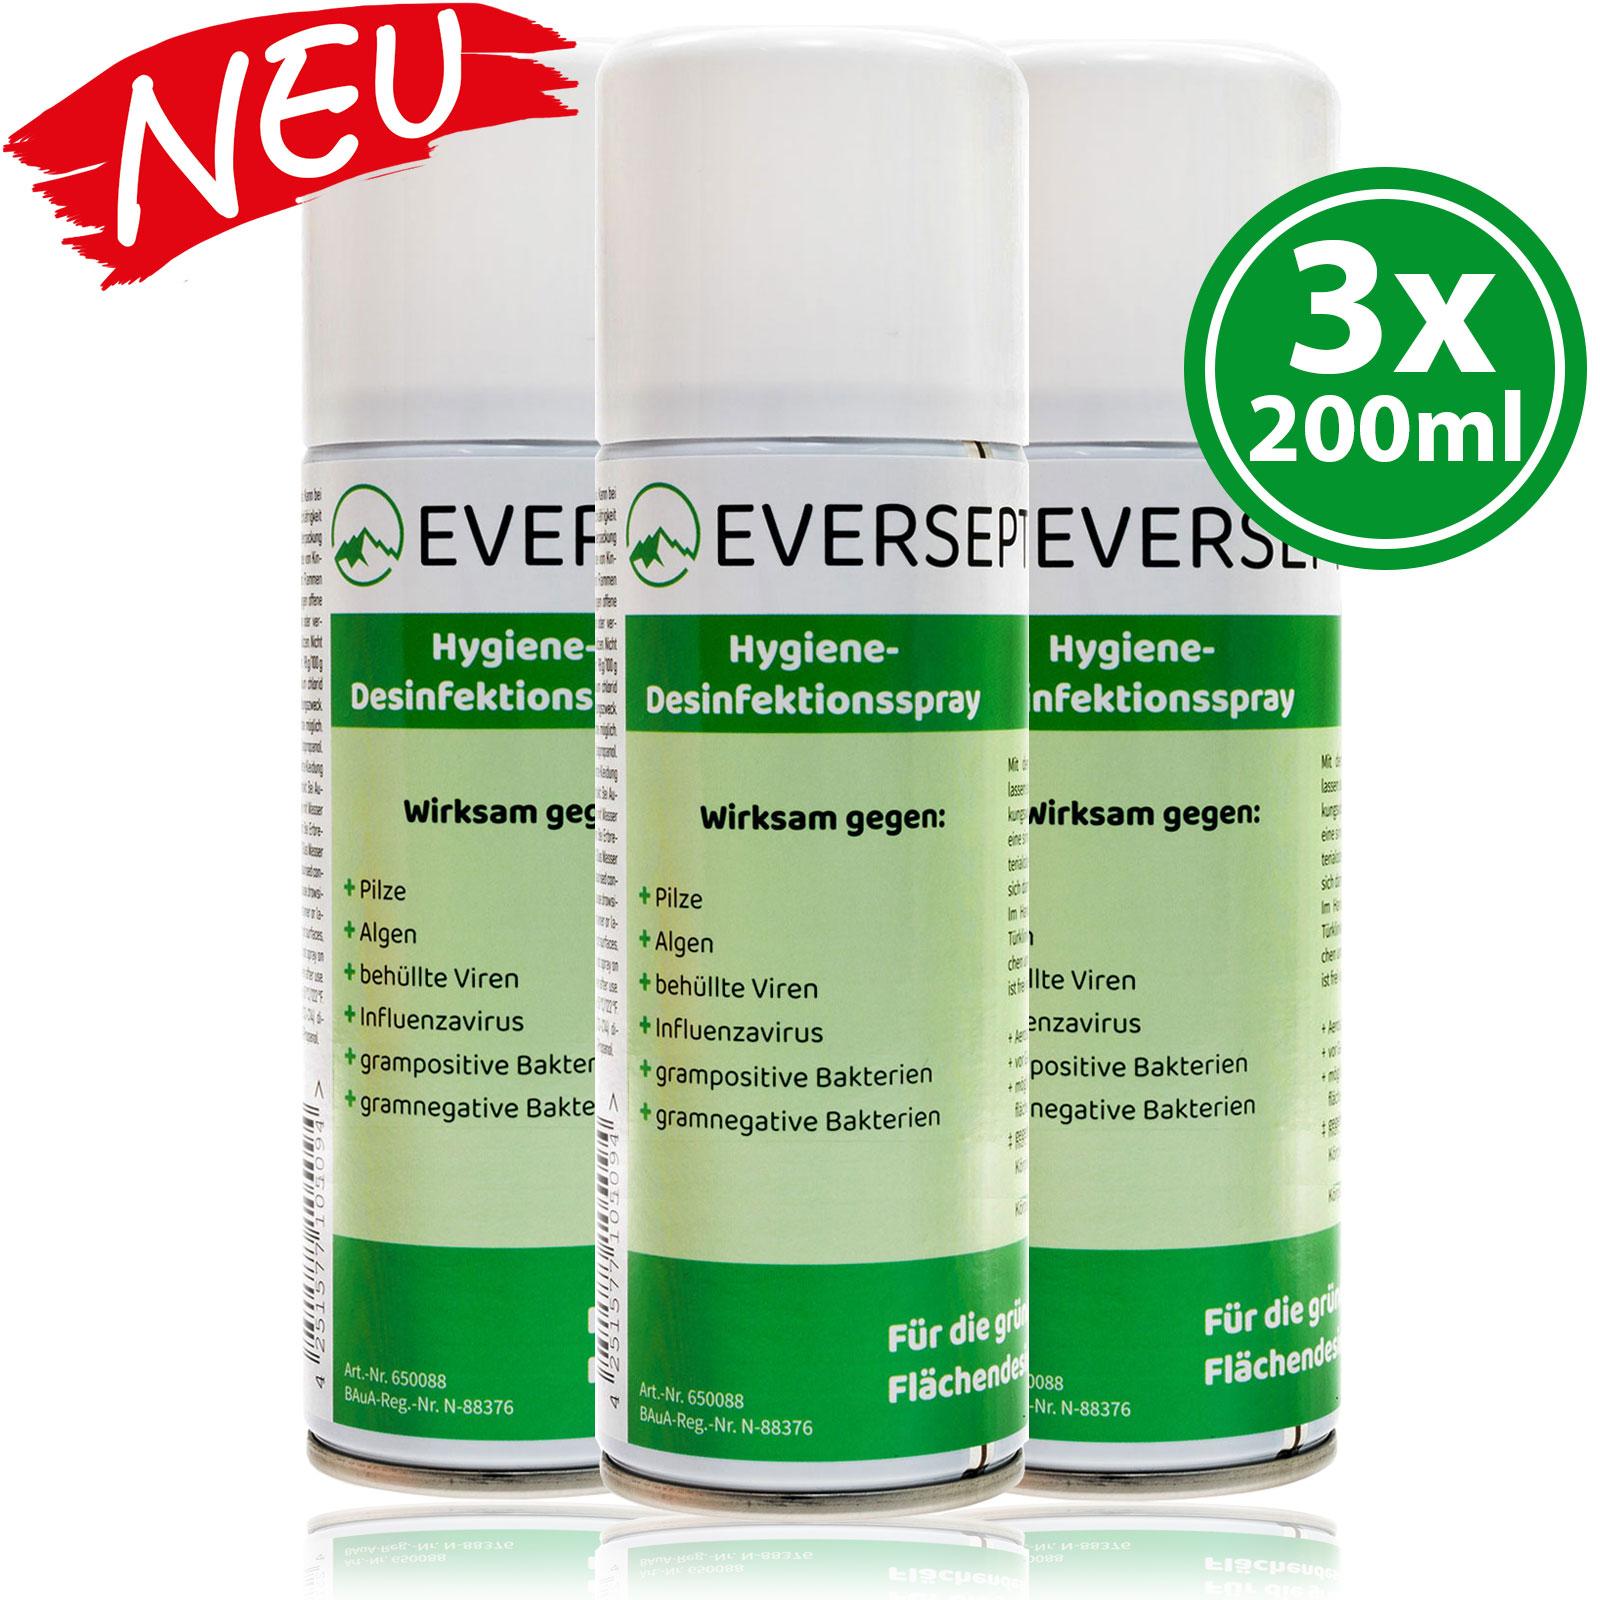 Eversept Hygiene Desinfektionsspray 200ml Aerosol